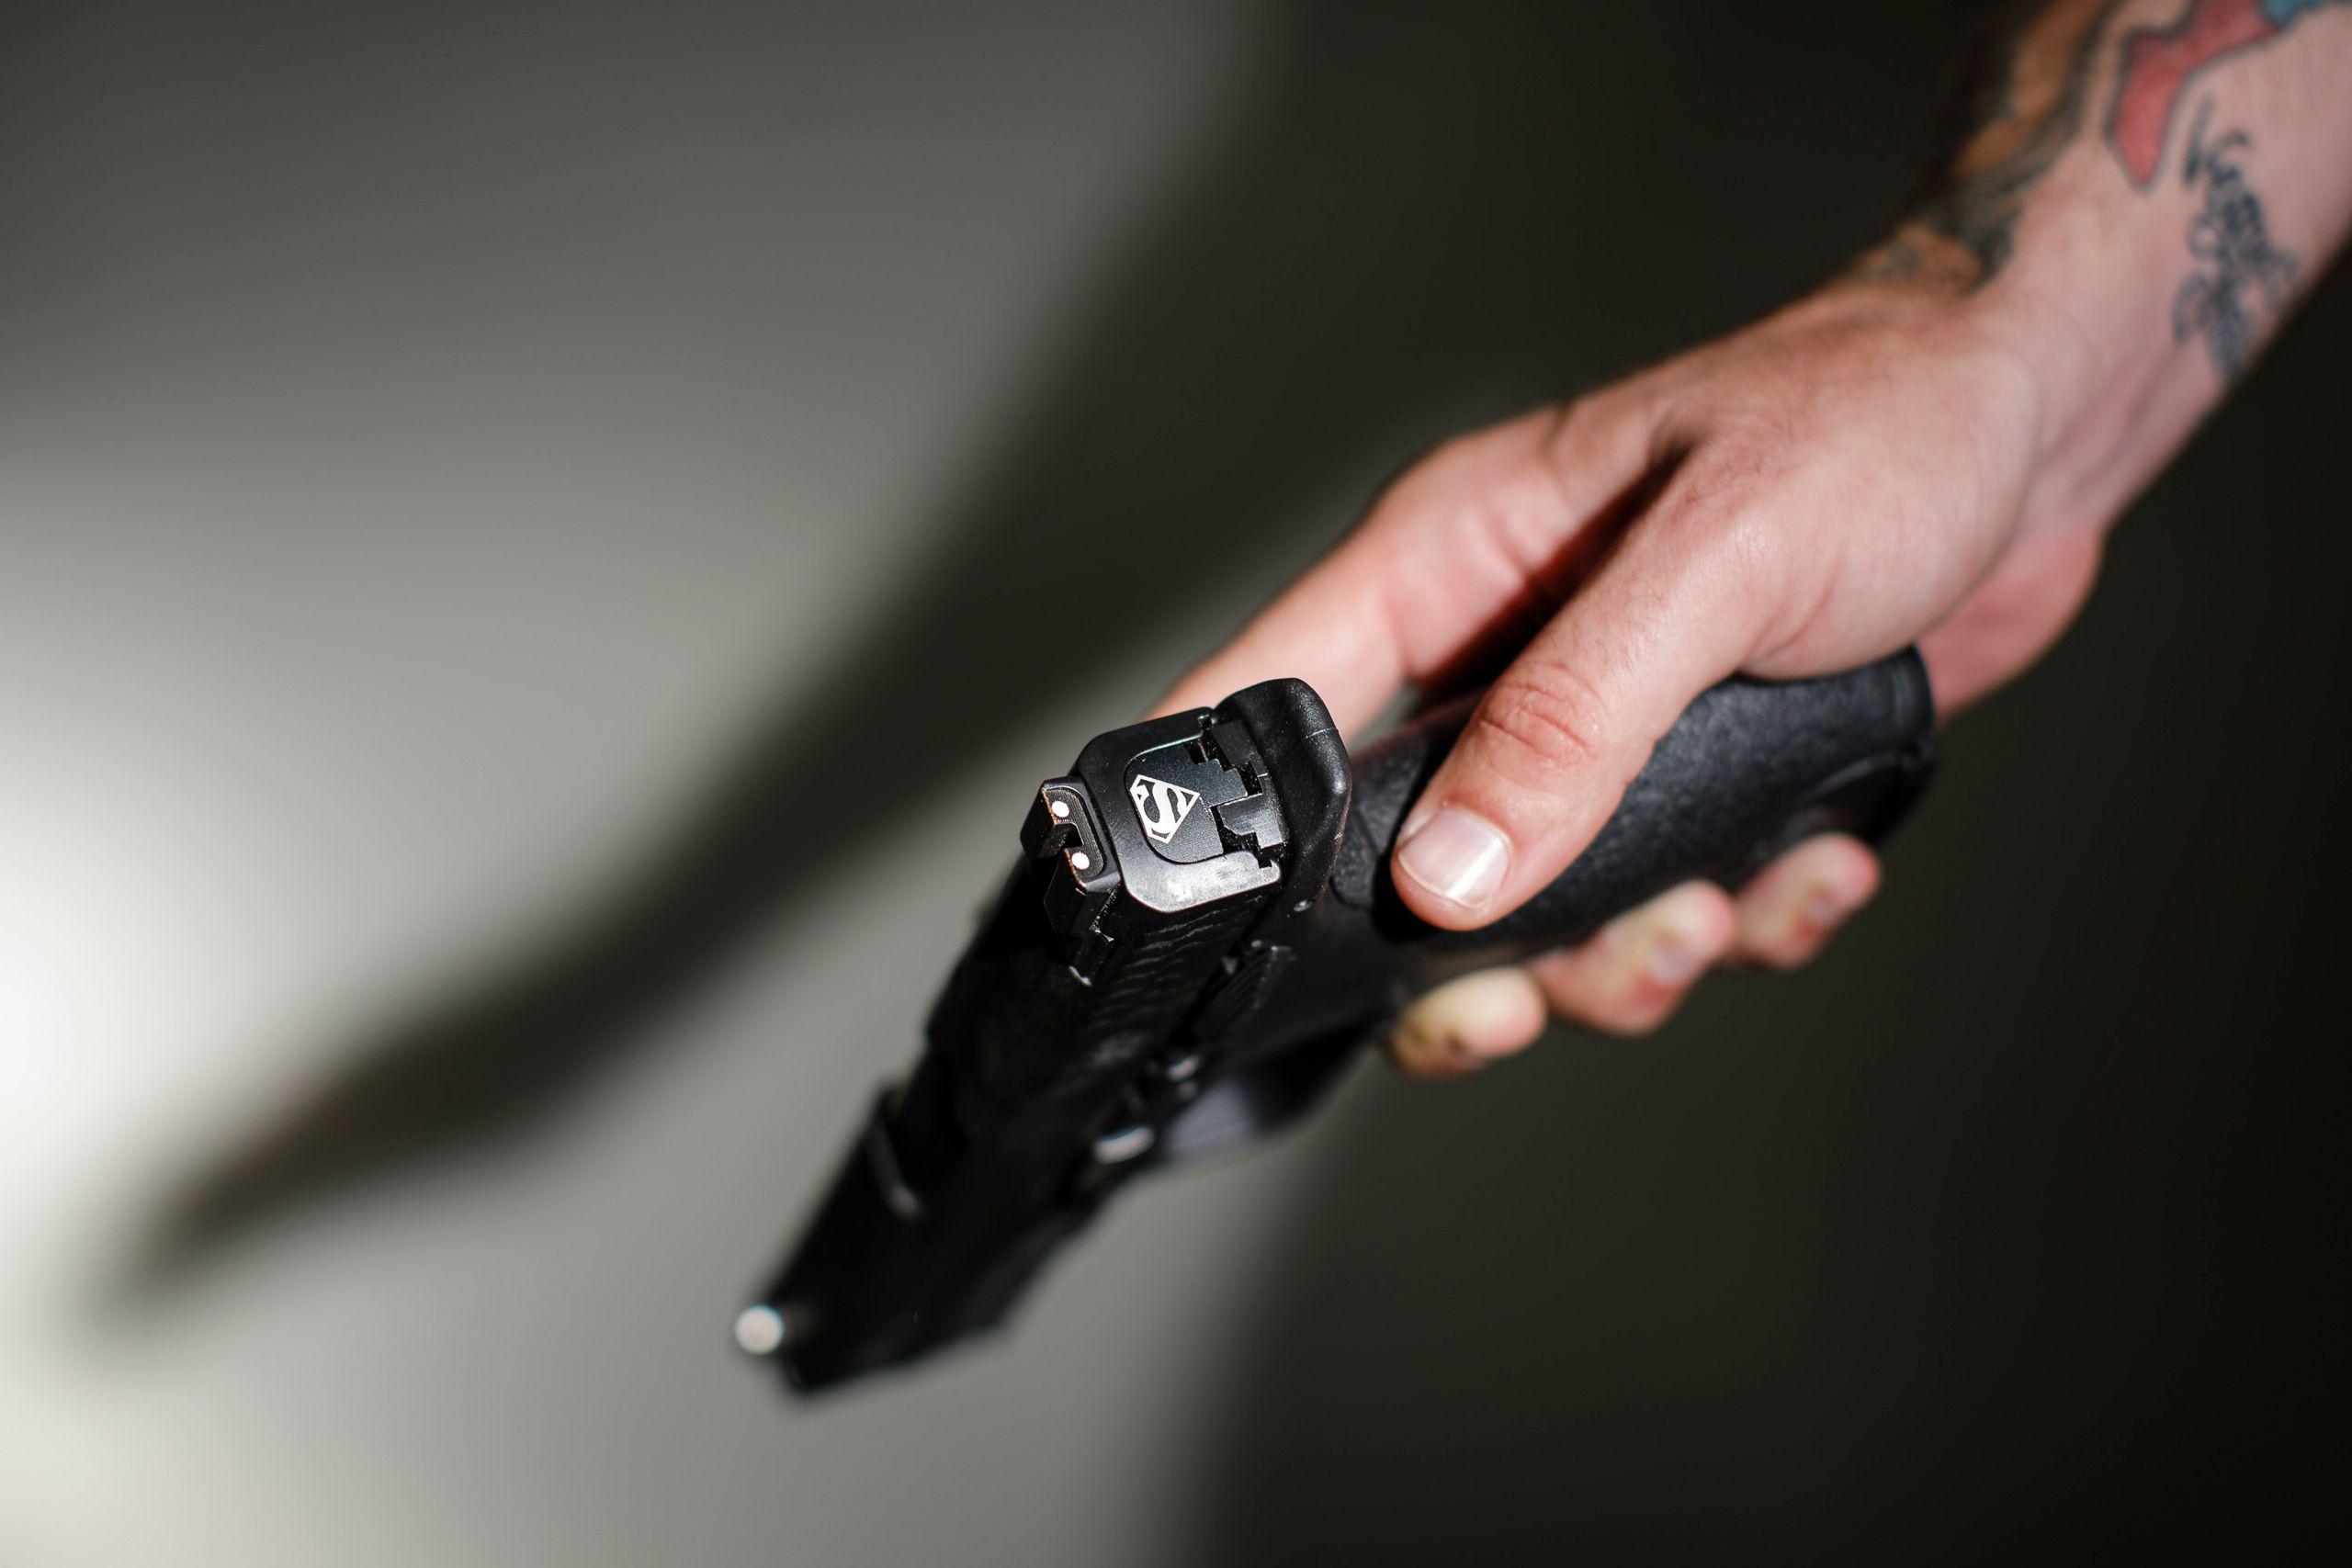 Hooper's .40 caliber handgun has a custom Superman logo.